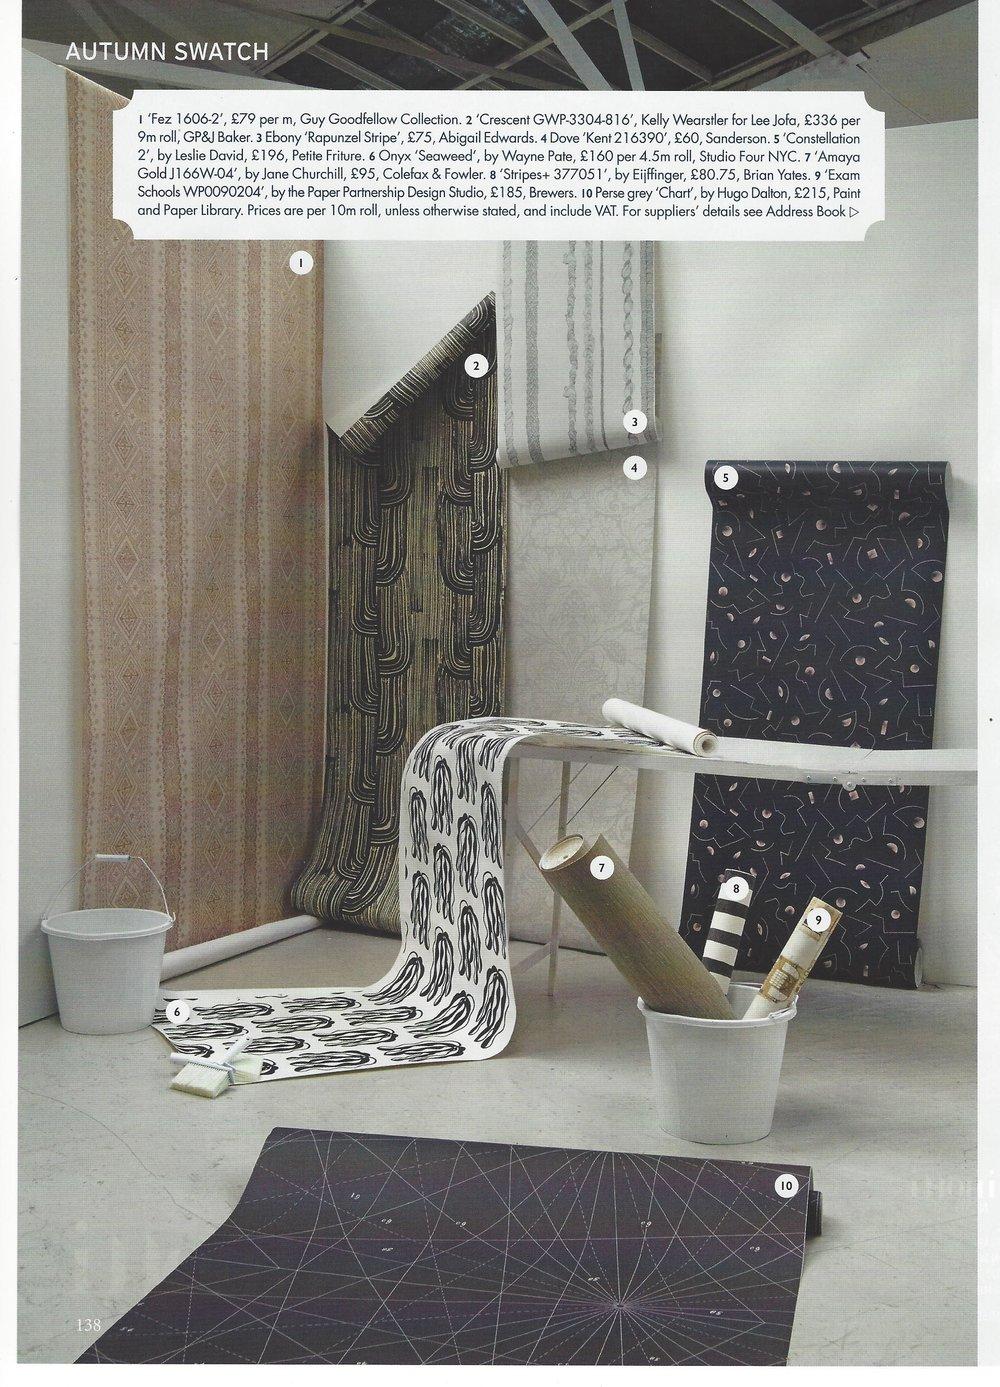 Rapunzel Stripe in World of Interiors